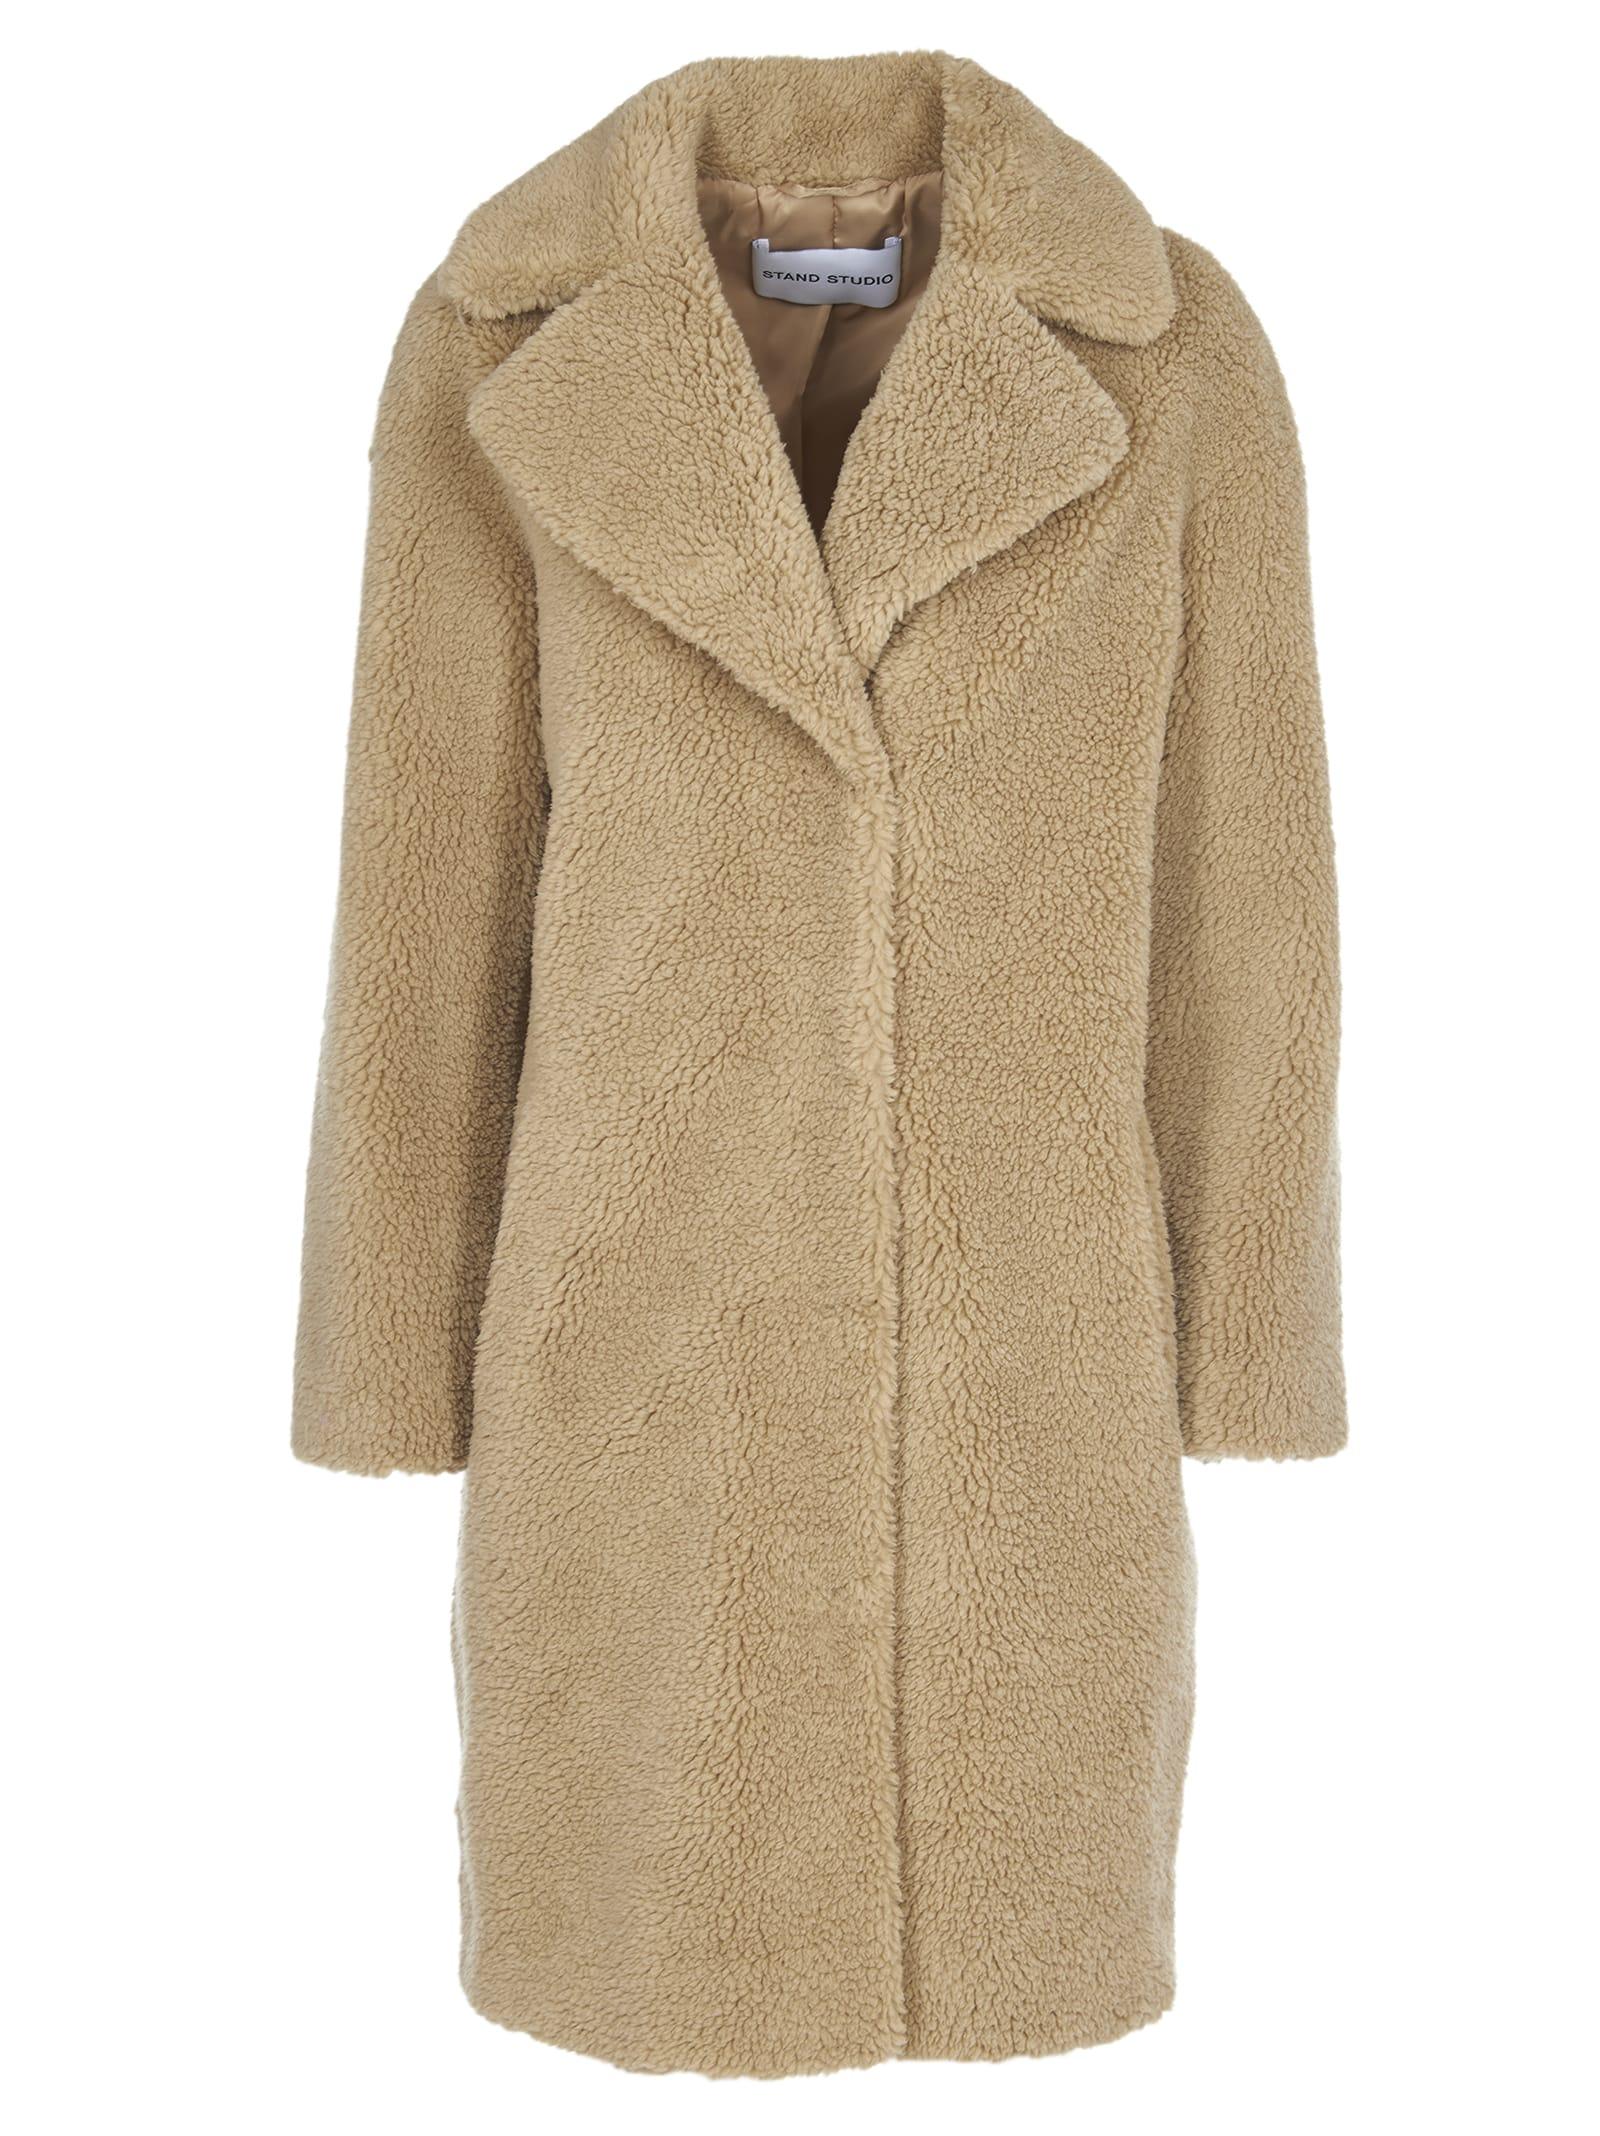 STAND STUDIO camille Beige Faux Fur Coat